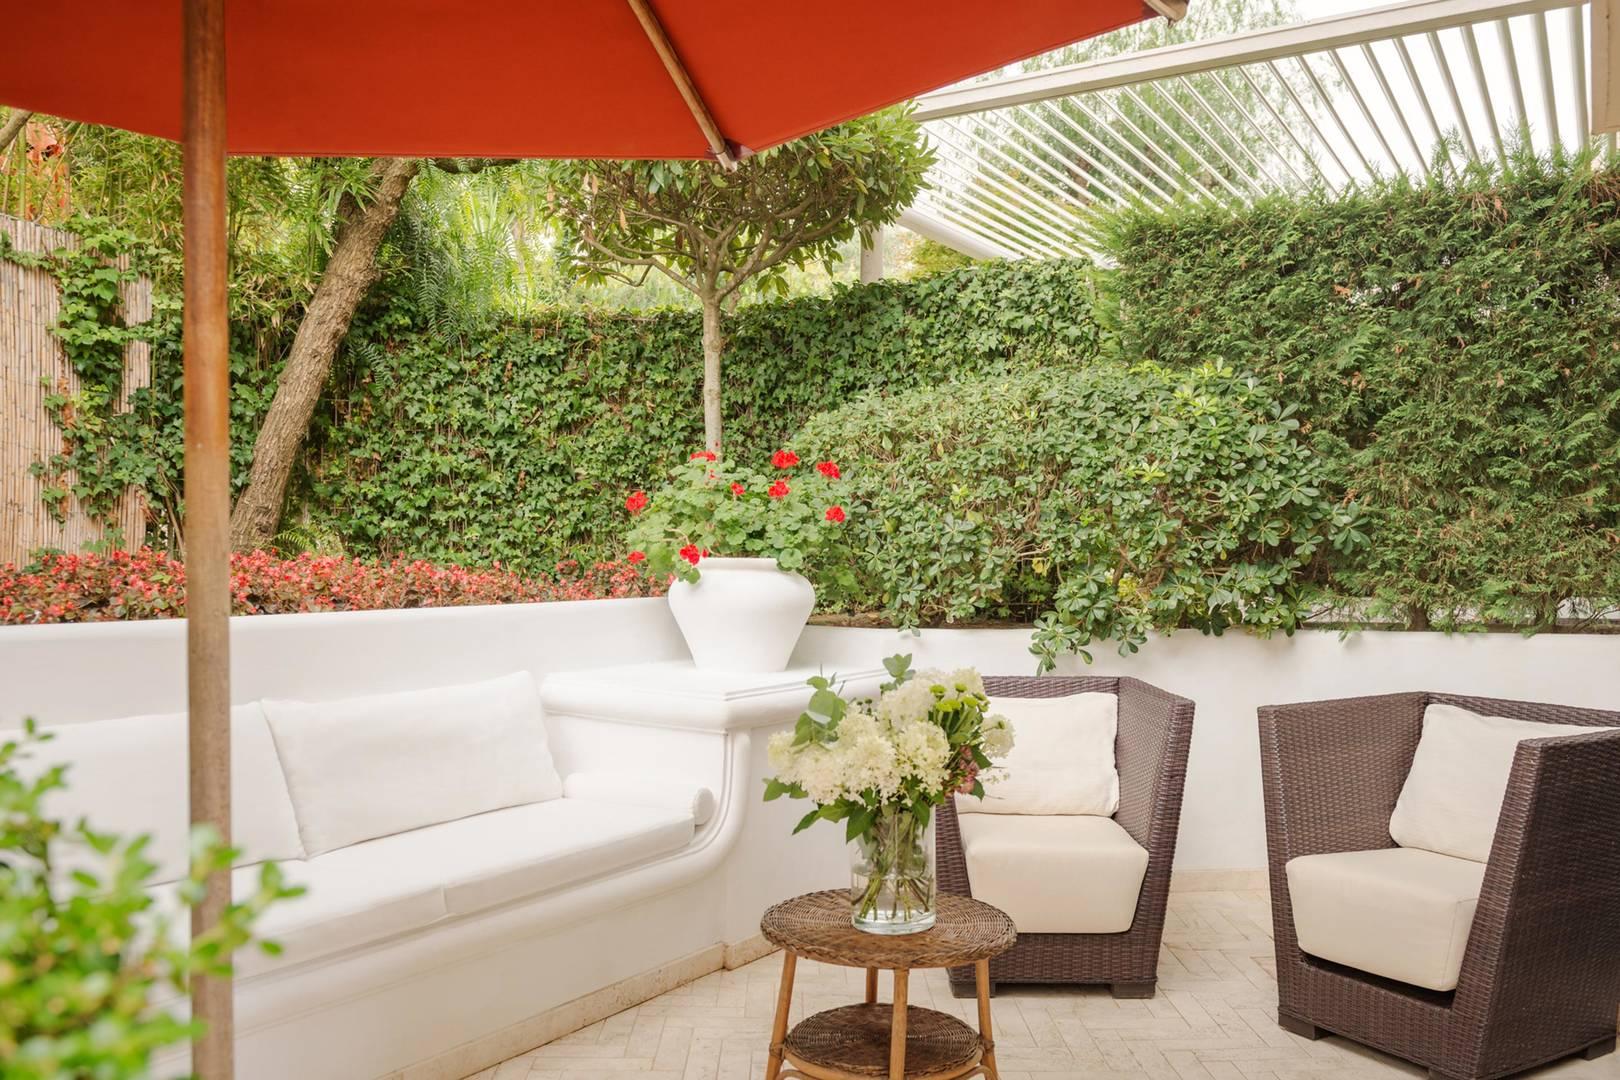 Capri Palace Jumeirah Classic Garden Side Terrace